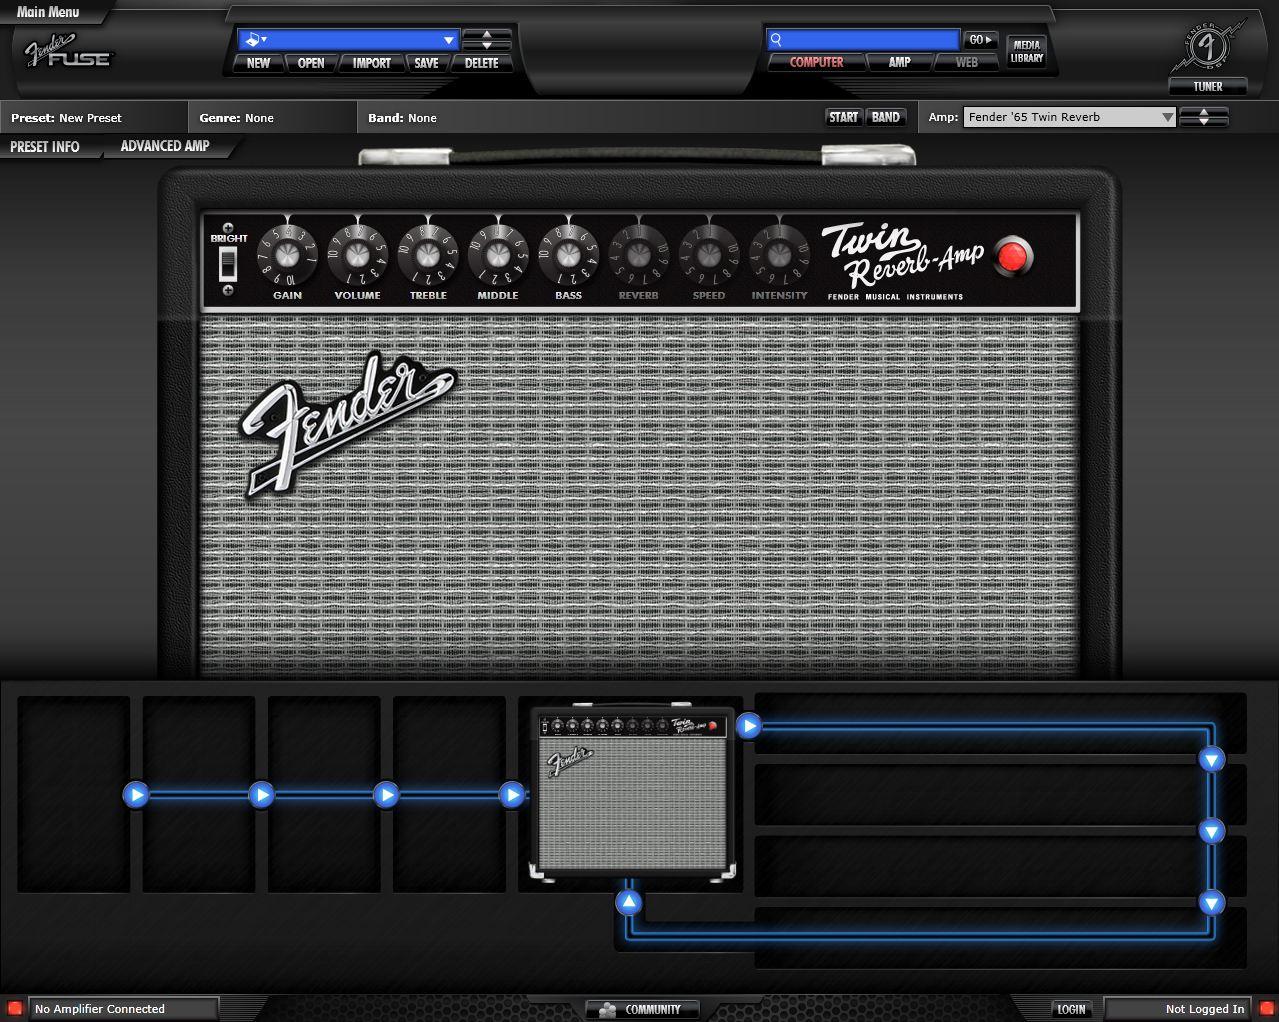 FUSE Amp theme